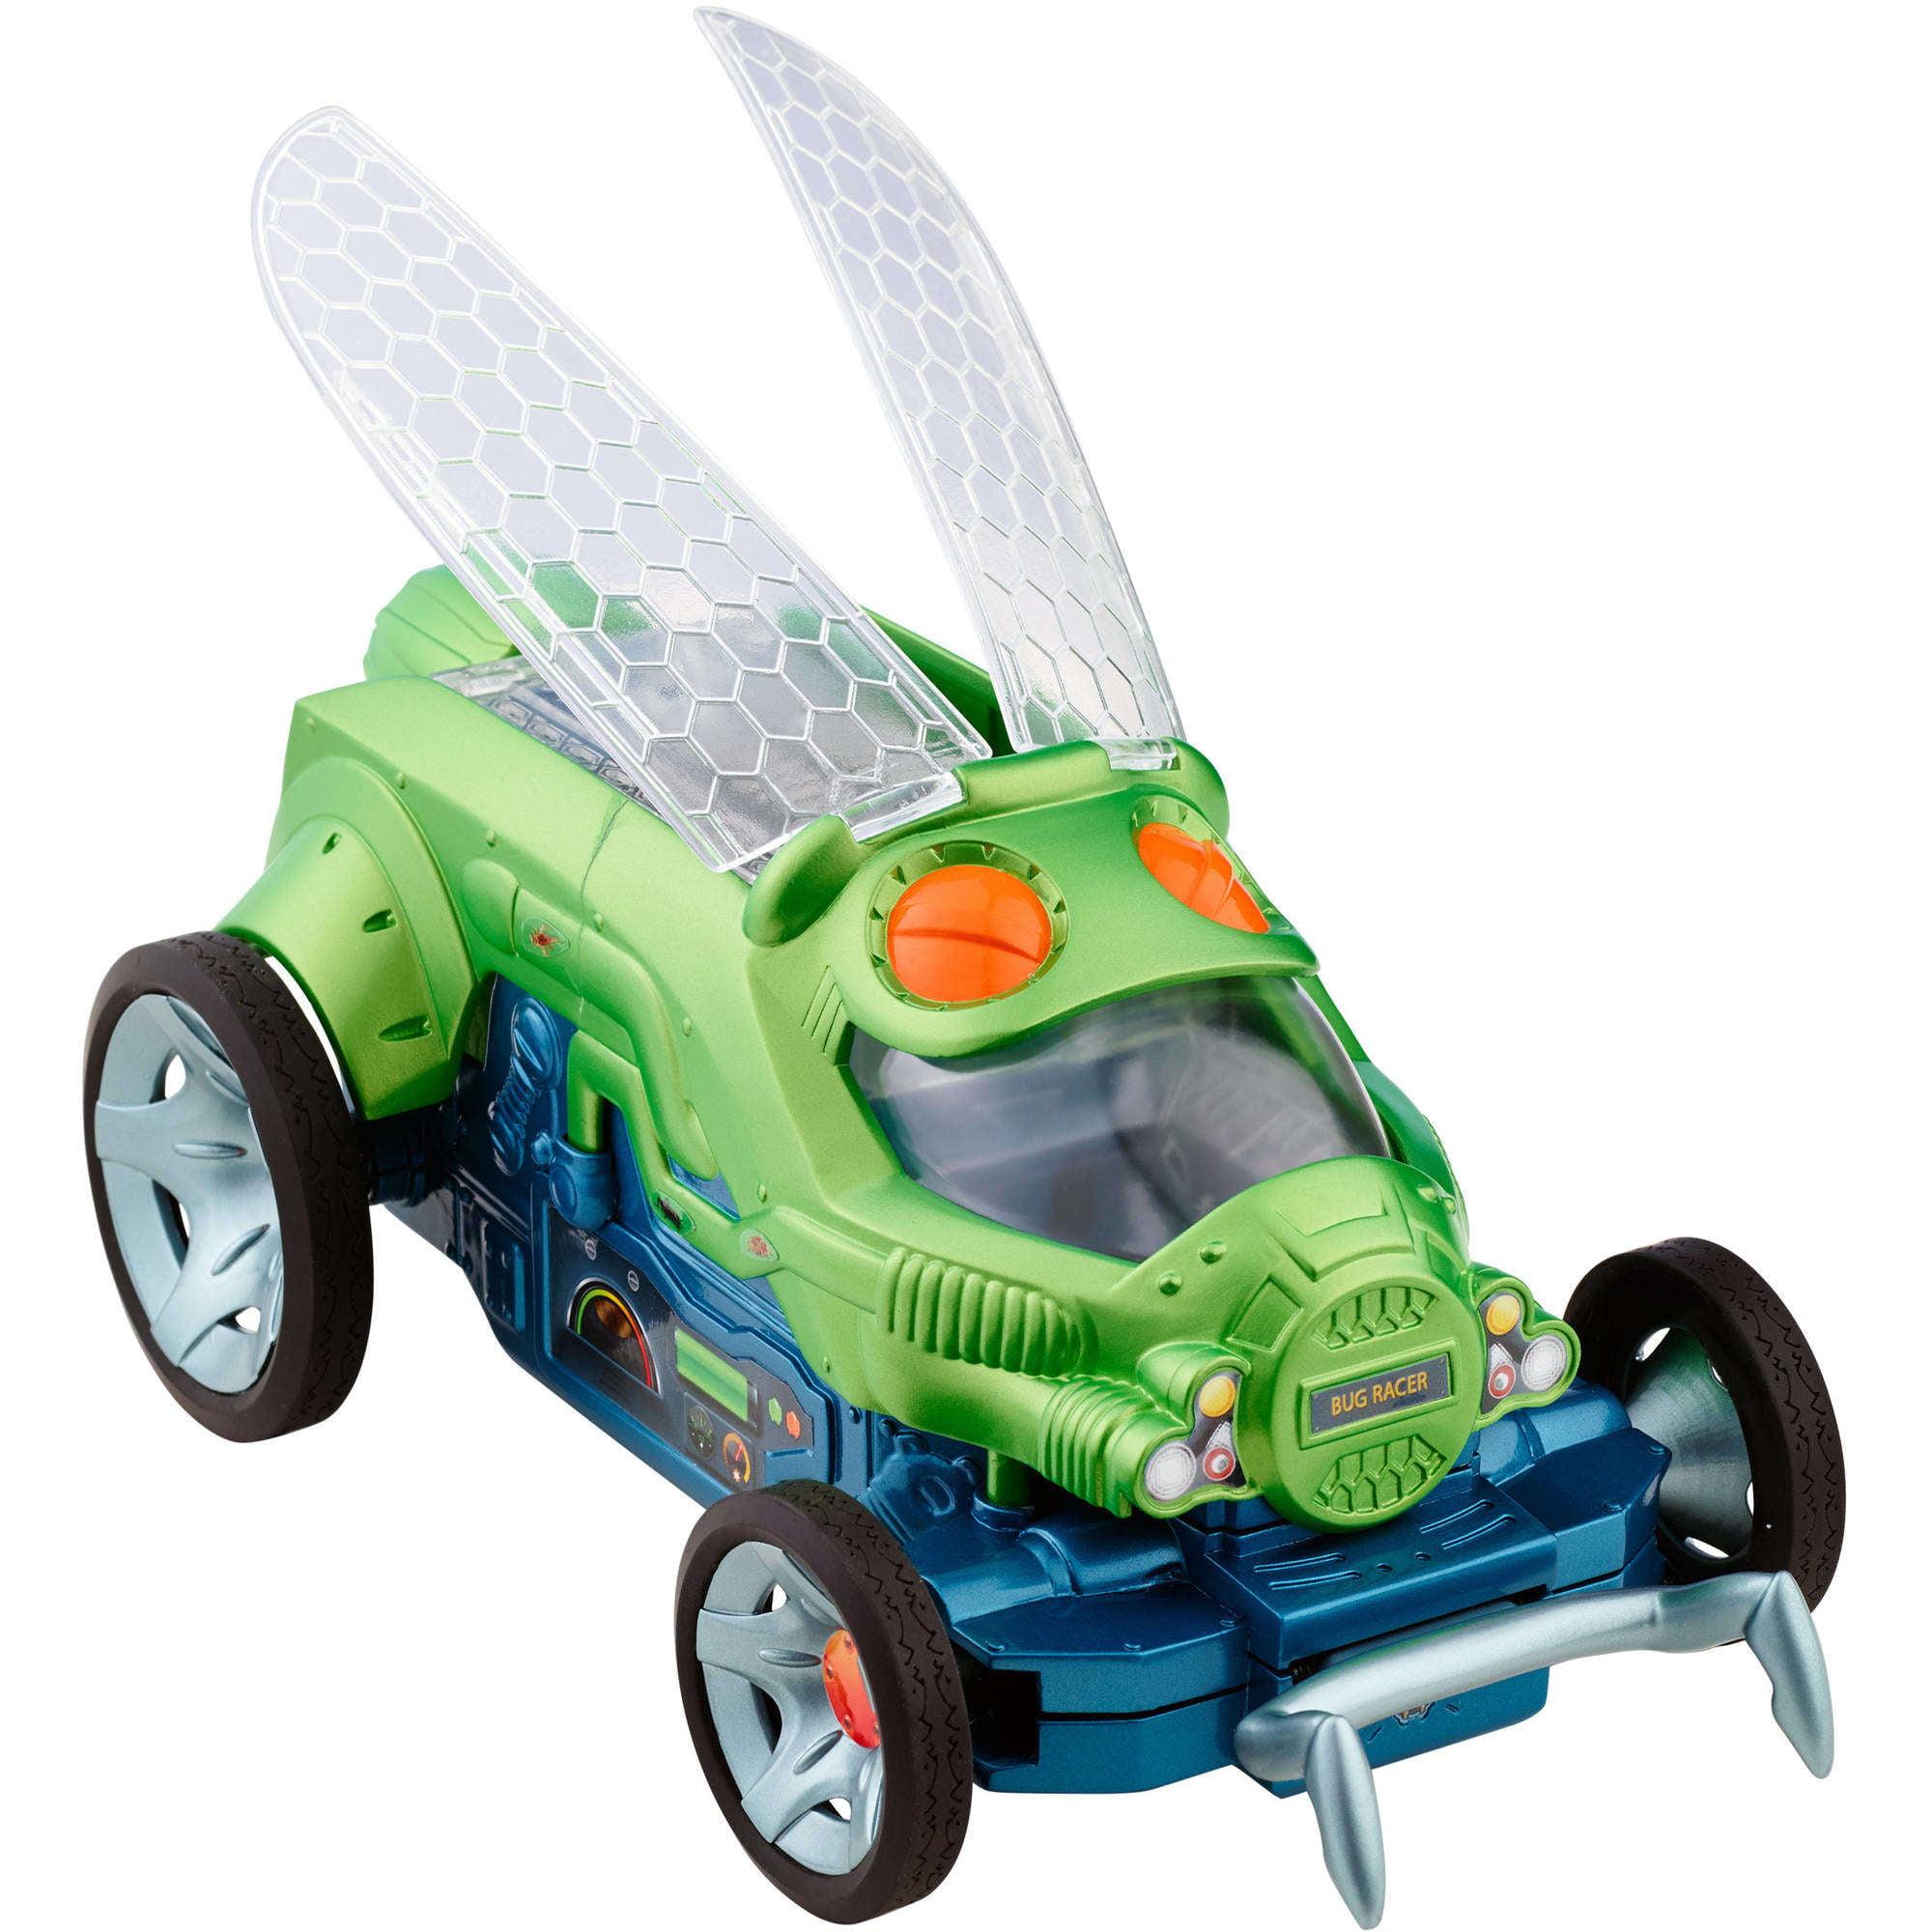 Bug Racer Powered by Elecrickety